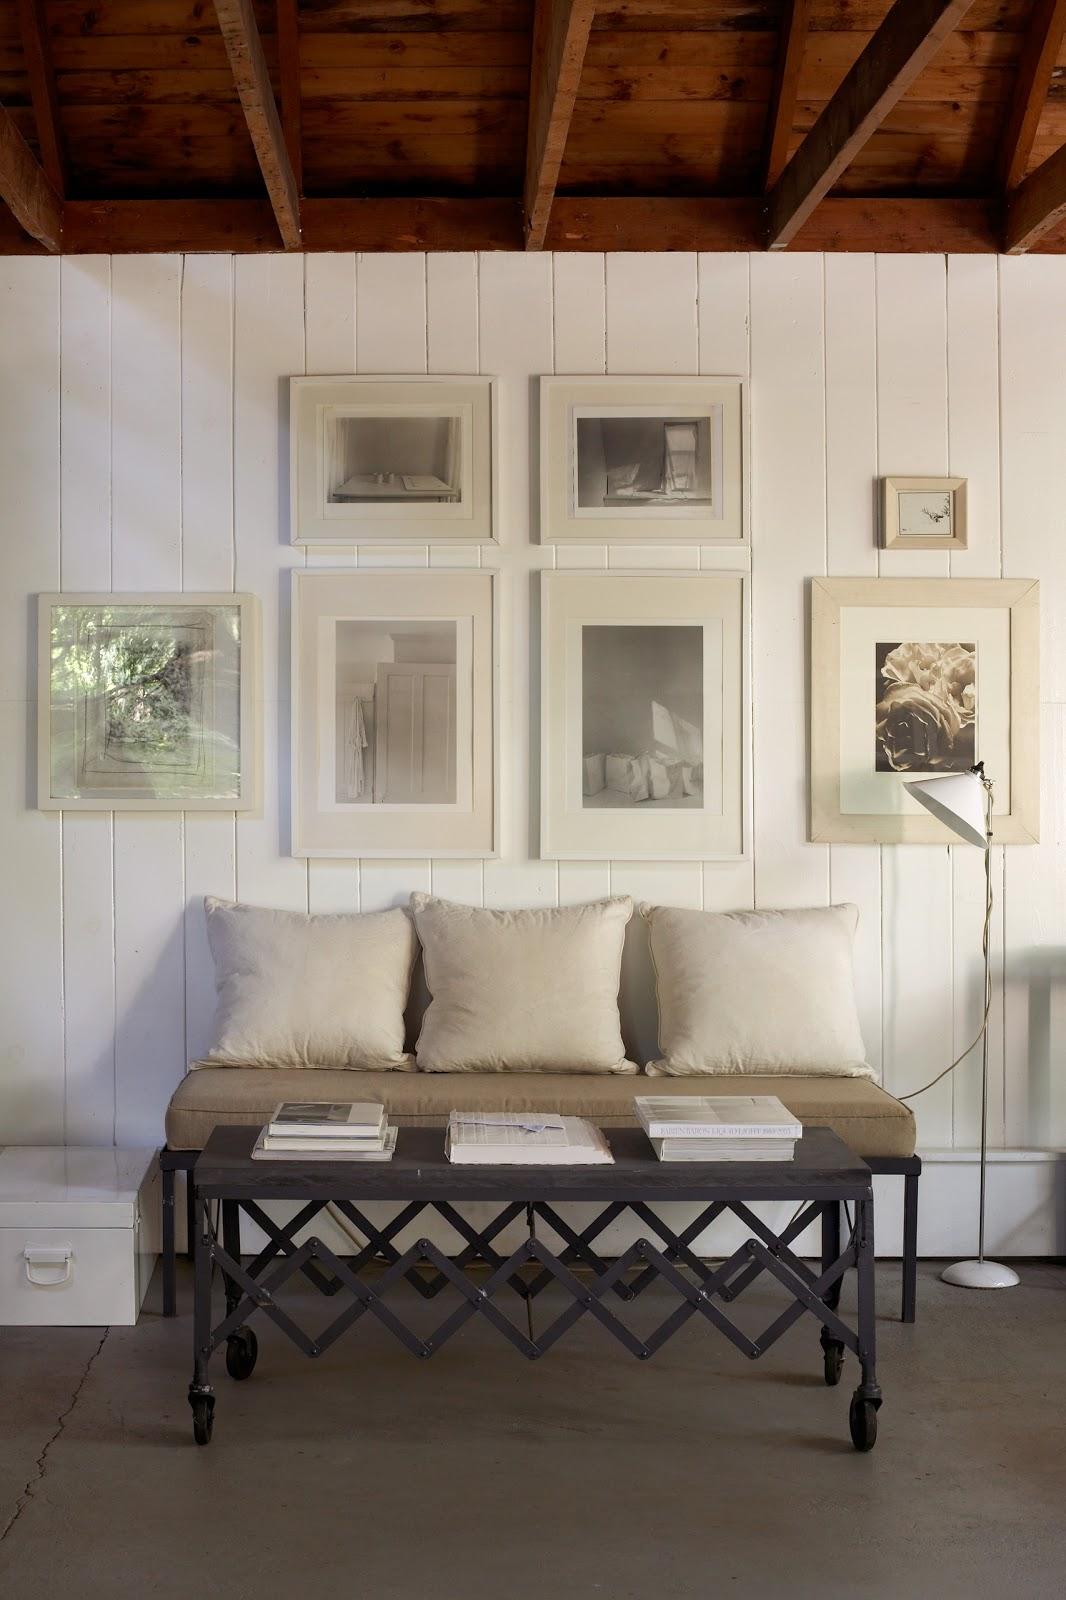 http://2.bp.blogspot.com/-U5nIaJSkCzI/TxCsxUZ8FvI/AAAAAAAABok/xhIWhI4kysc/s1600/white+framed+art.jpg